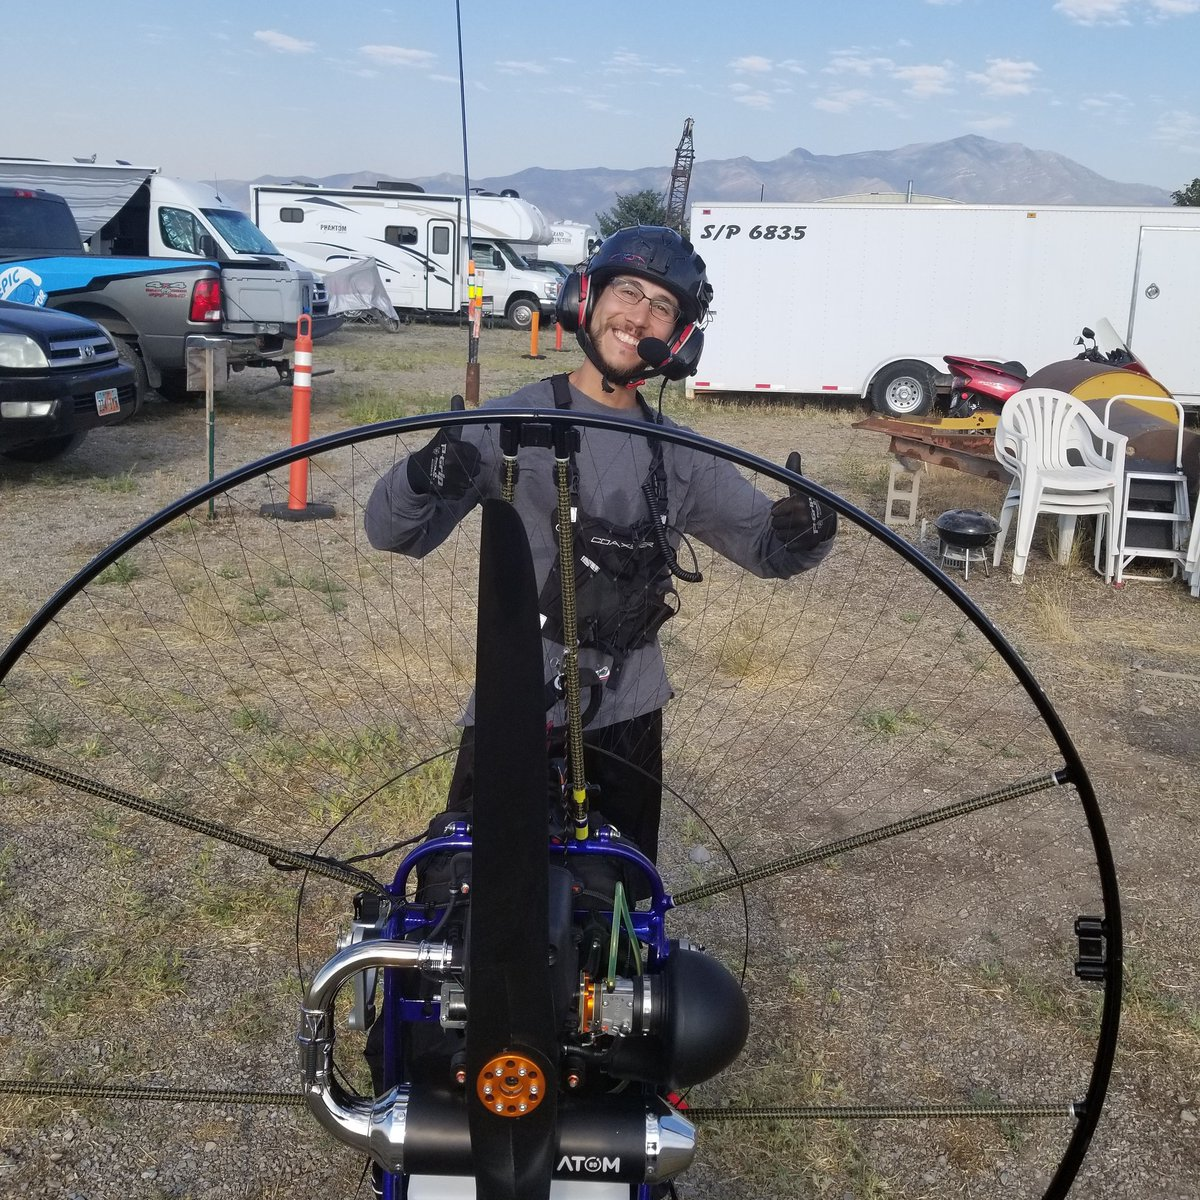 Cedar Valley Airport in Eagle Mountain Utah August 3, 2020  Paramotor classes this week by Epic Paramotor   @SeanReyesUT https://t.co/x3rRpW5Ftb